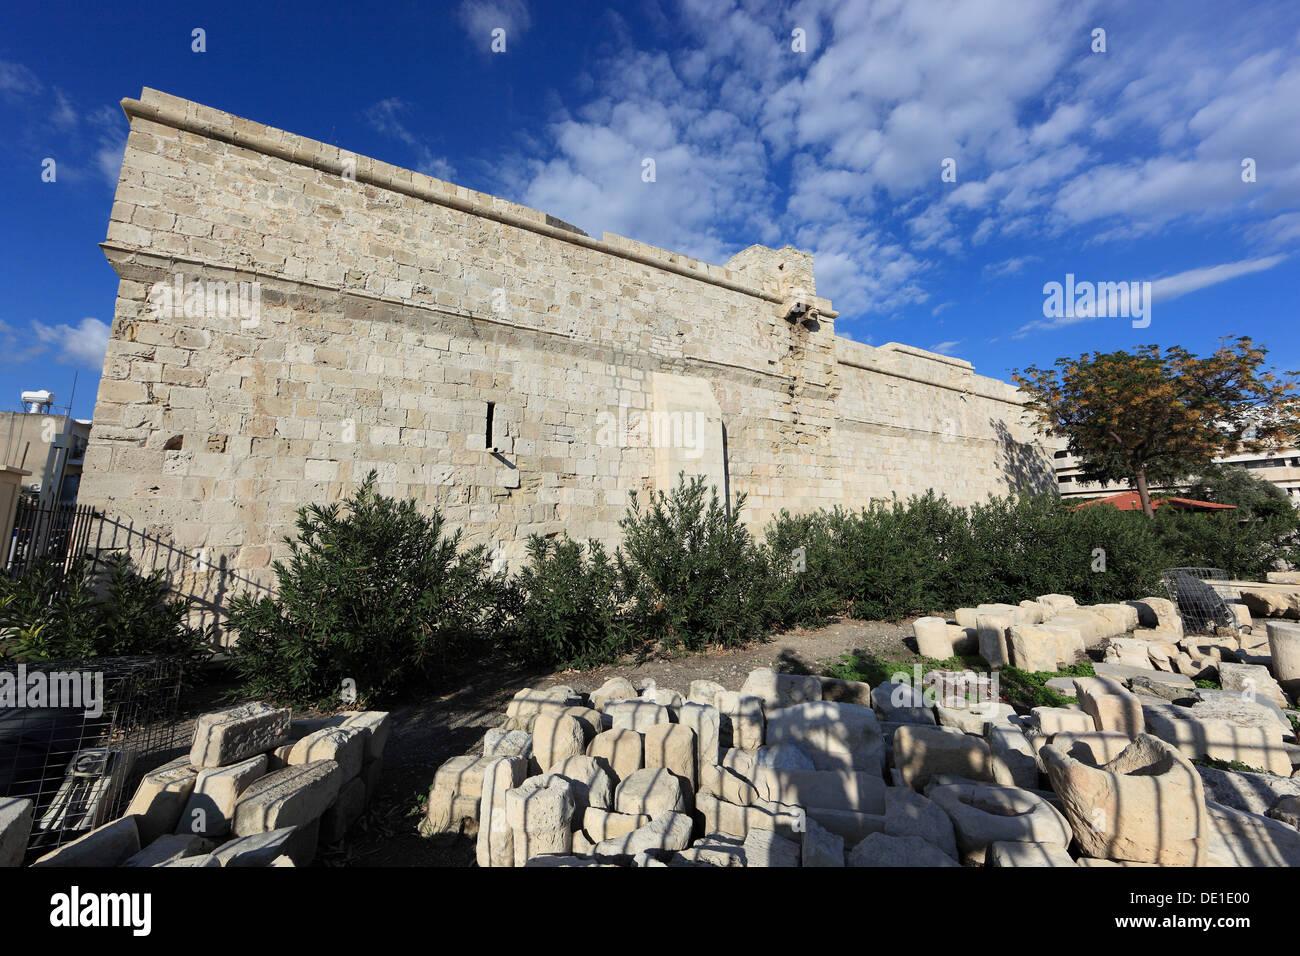 Cyprus, Limassol, Lemesos, Castle, Fort - Stock Image